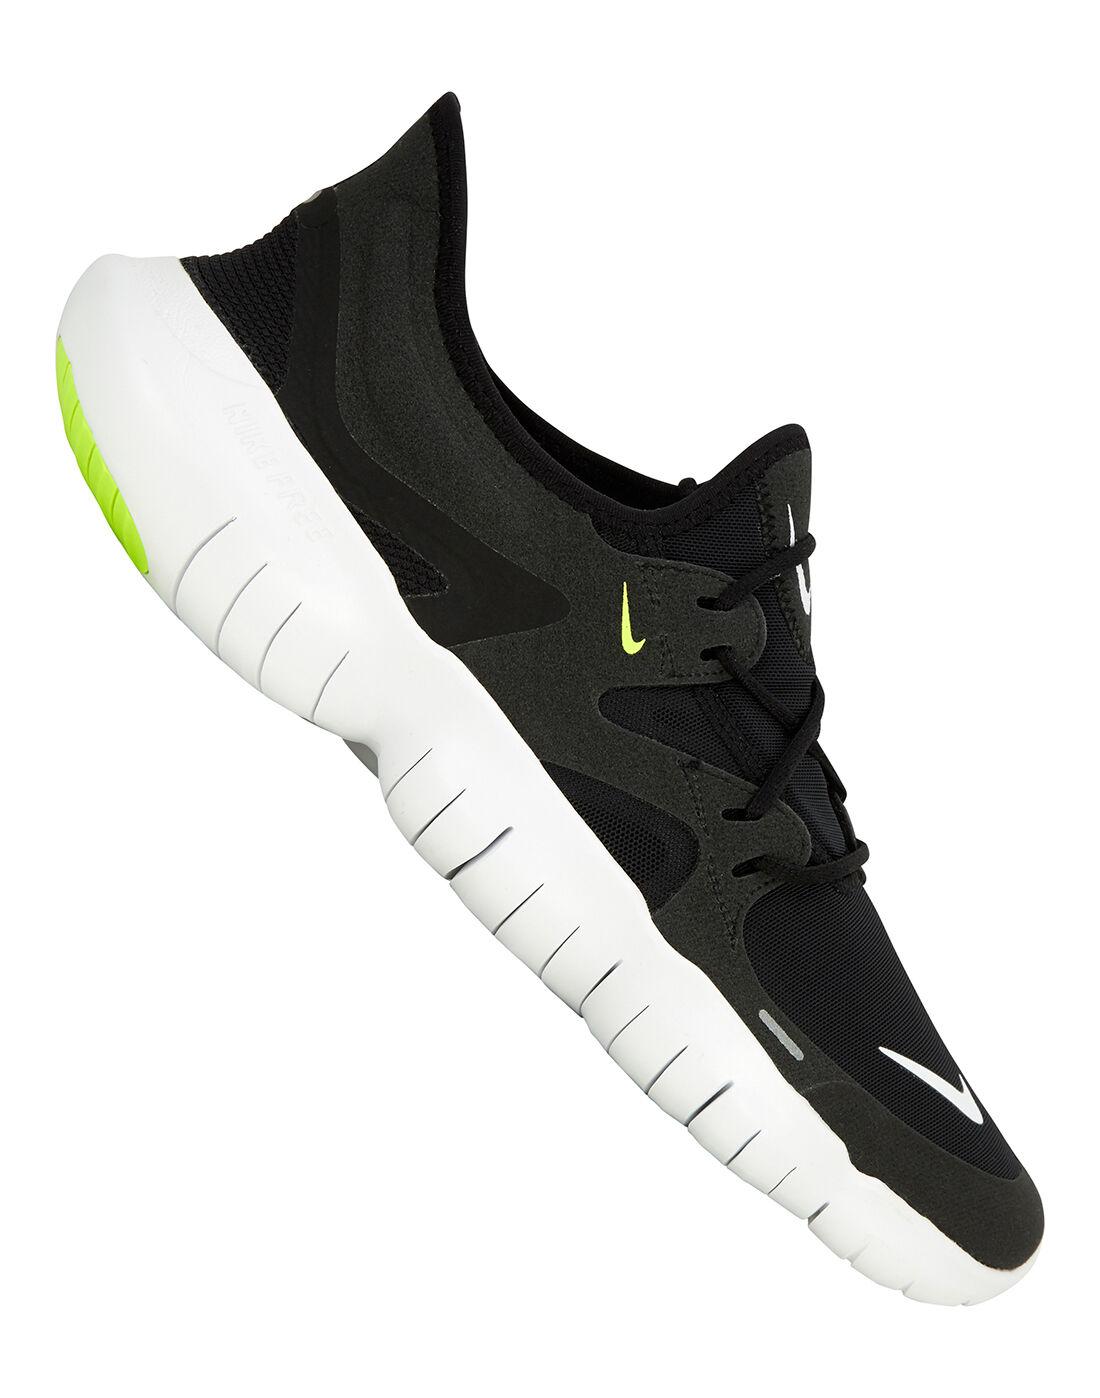 Men's Black Nike Free Run 5.0 | Life